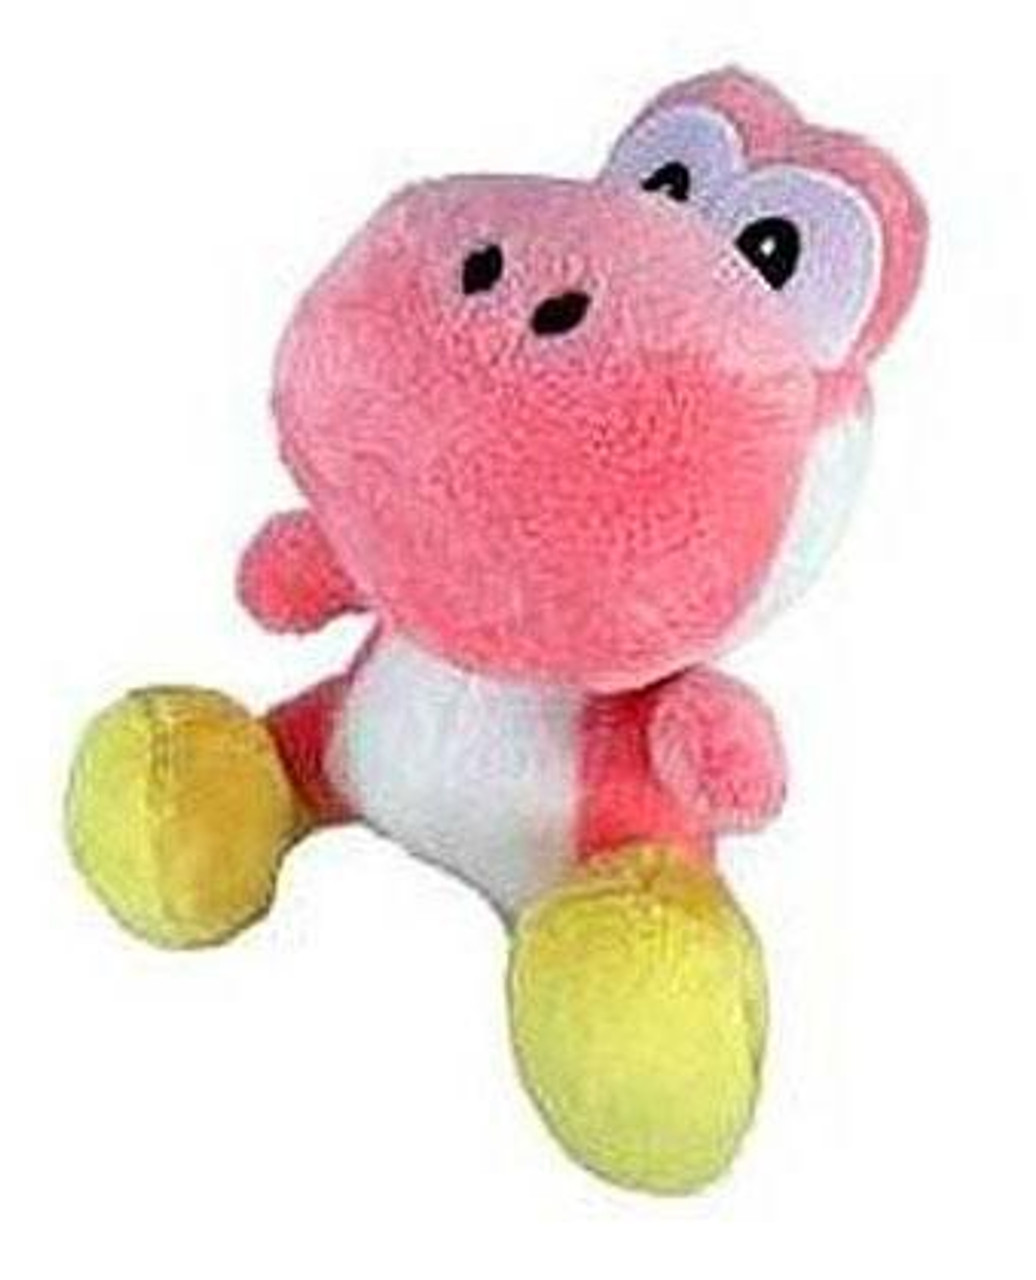 Little Buddy Super Mario Pink Yoshi 8 Inch Plush Figure NEW IN STOCK